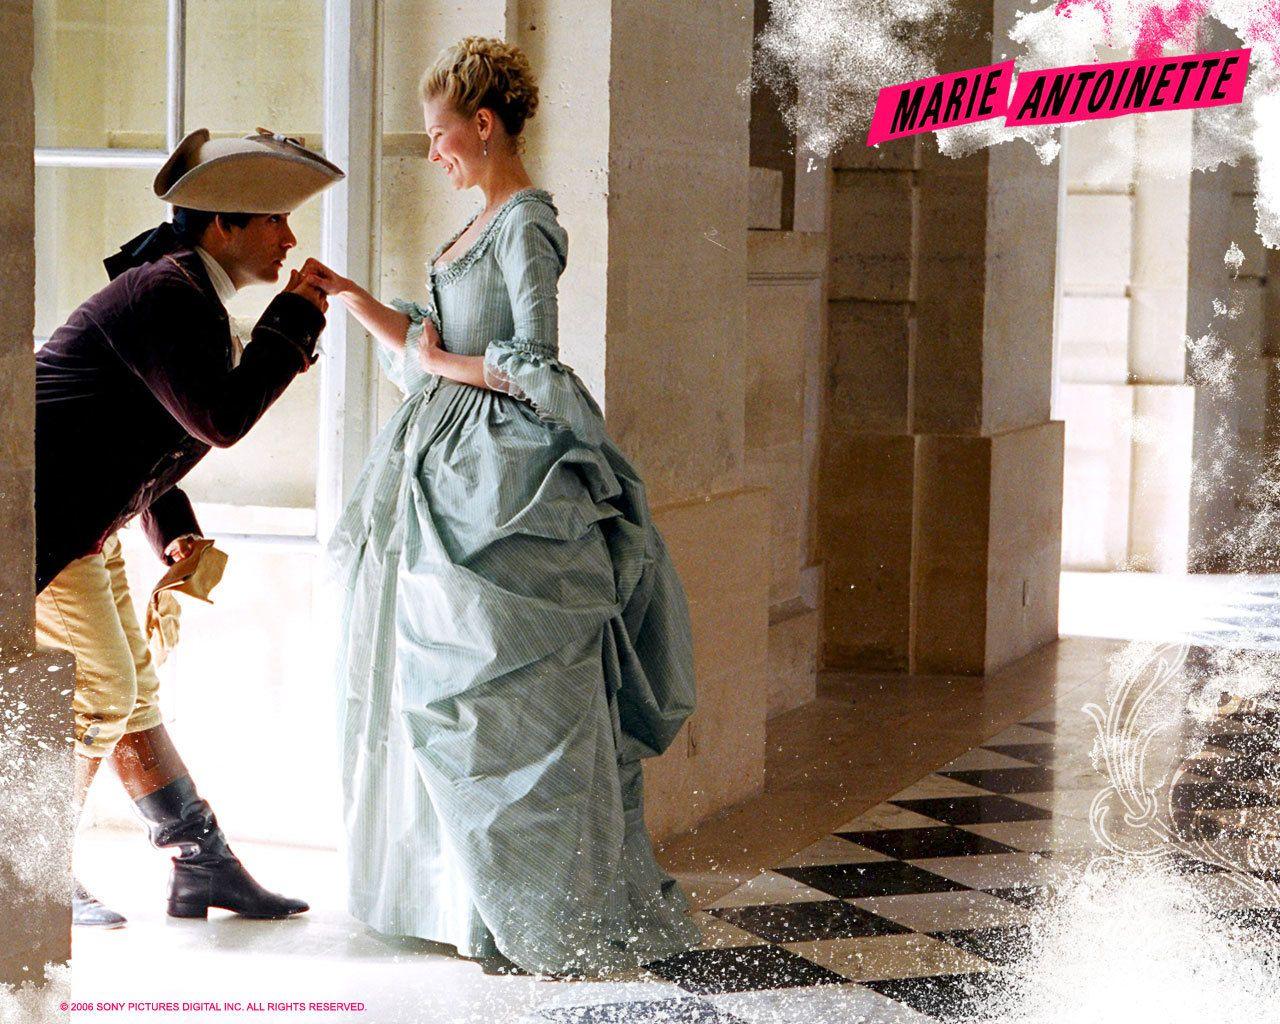 Baroque 18th century rococo fashion Marie Antoinette movie